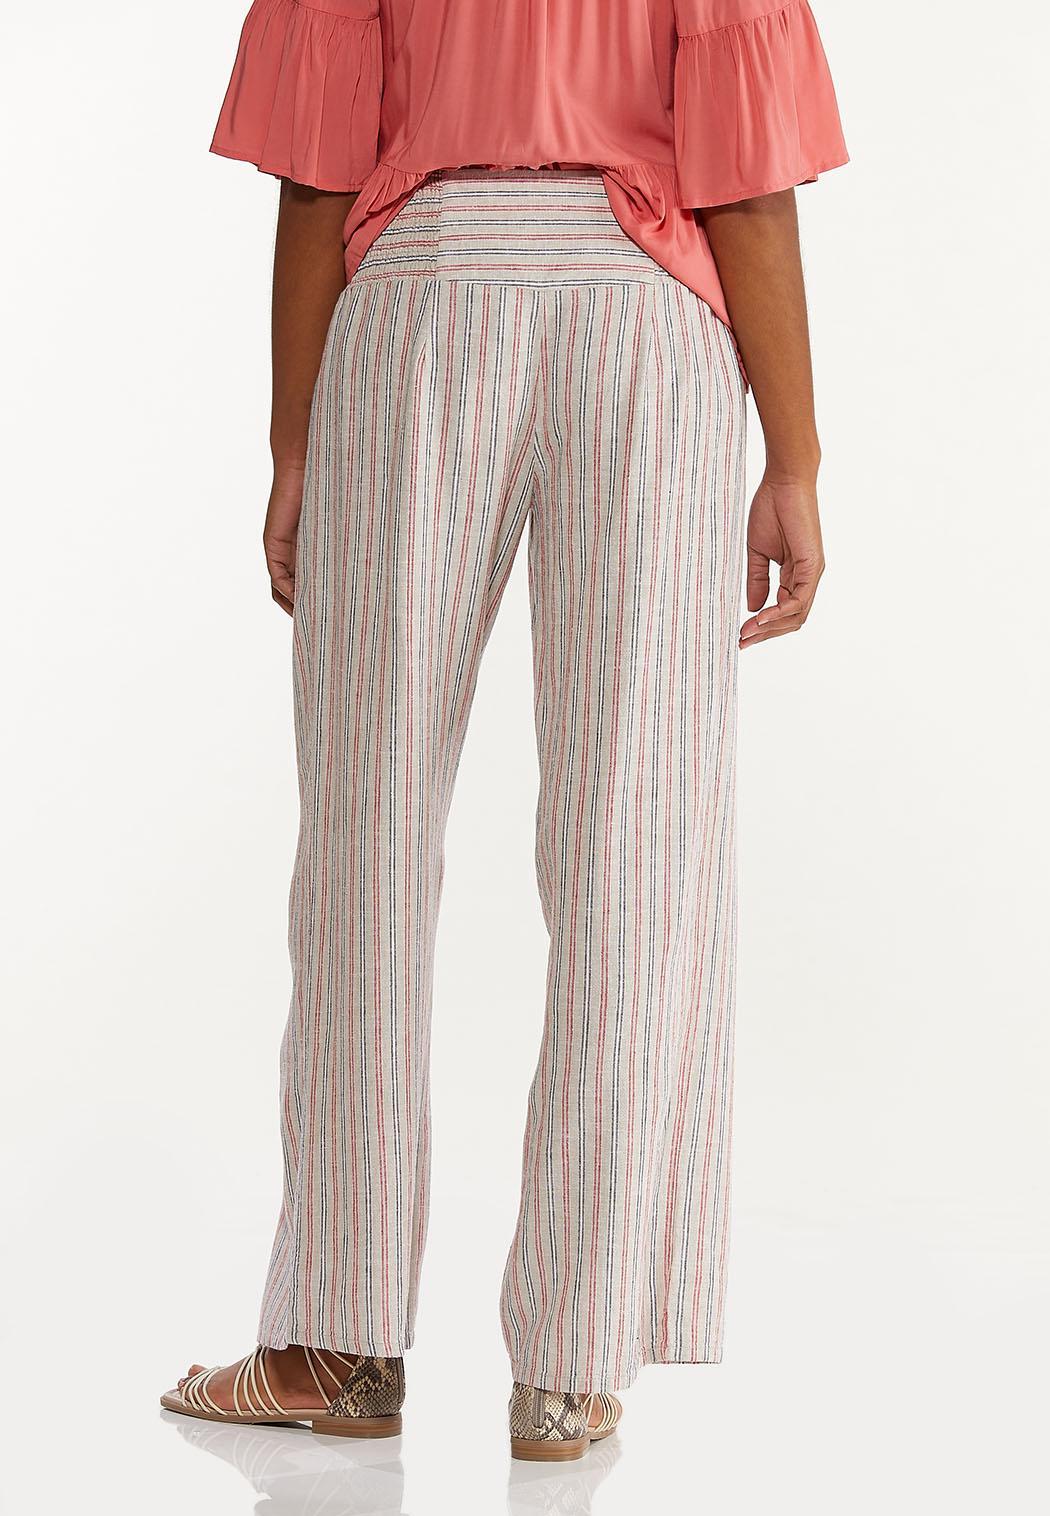 Striped Smocked Linen Pants (Item #44570196)